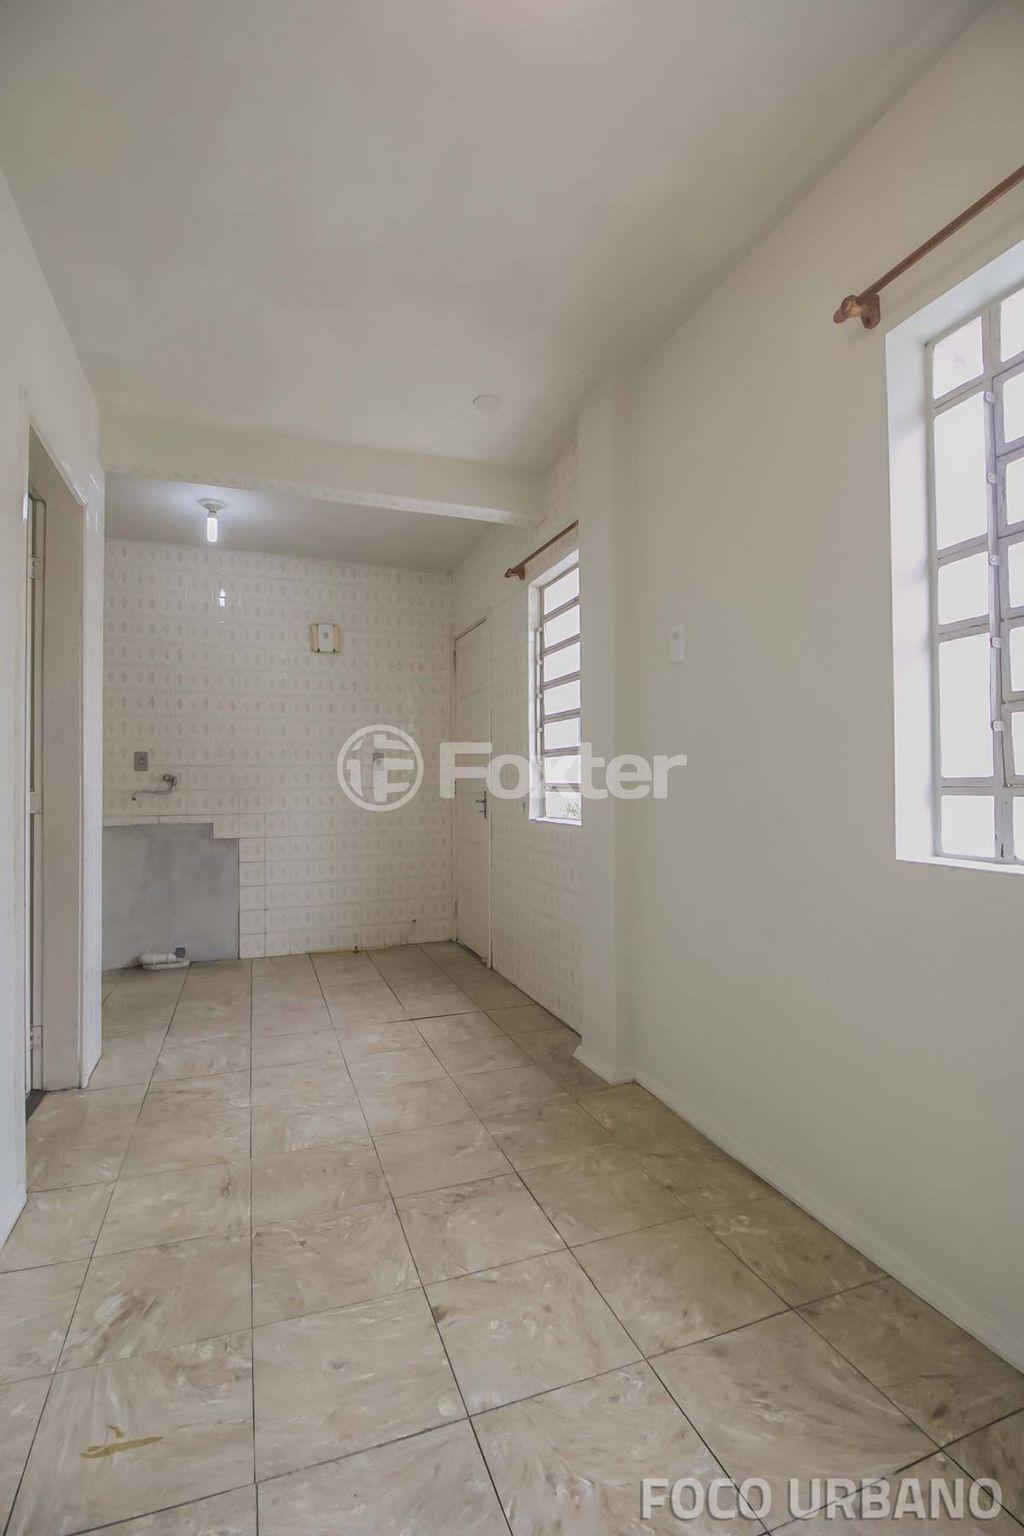 Cobertura 3 Dorm, Floresta, Porto Alegre (131523) - Foto 21